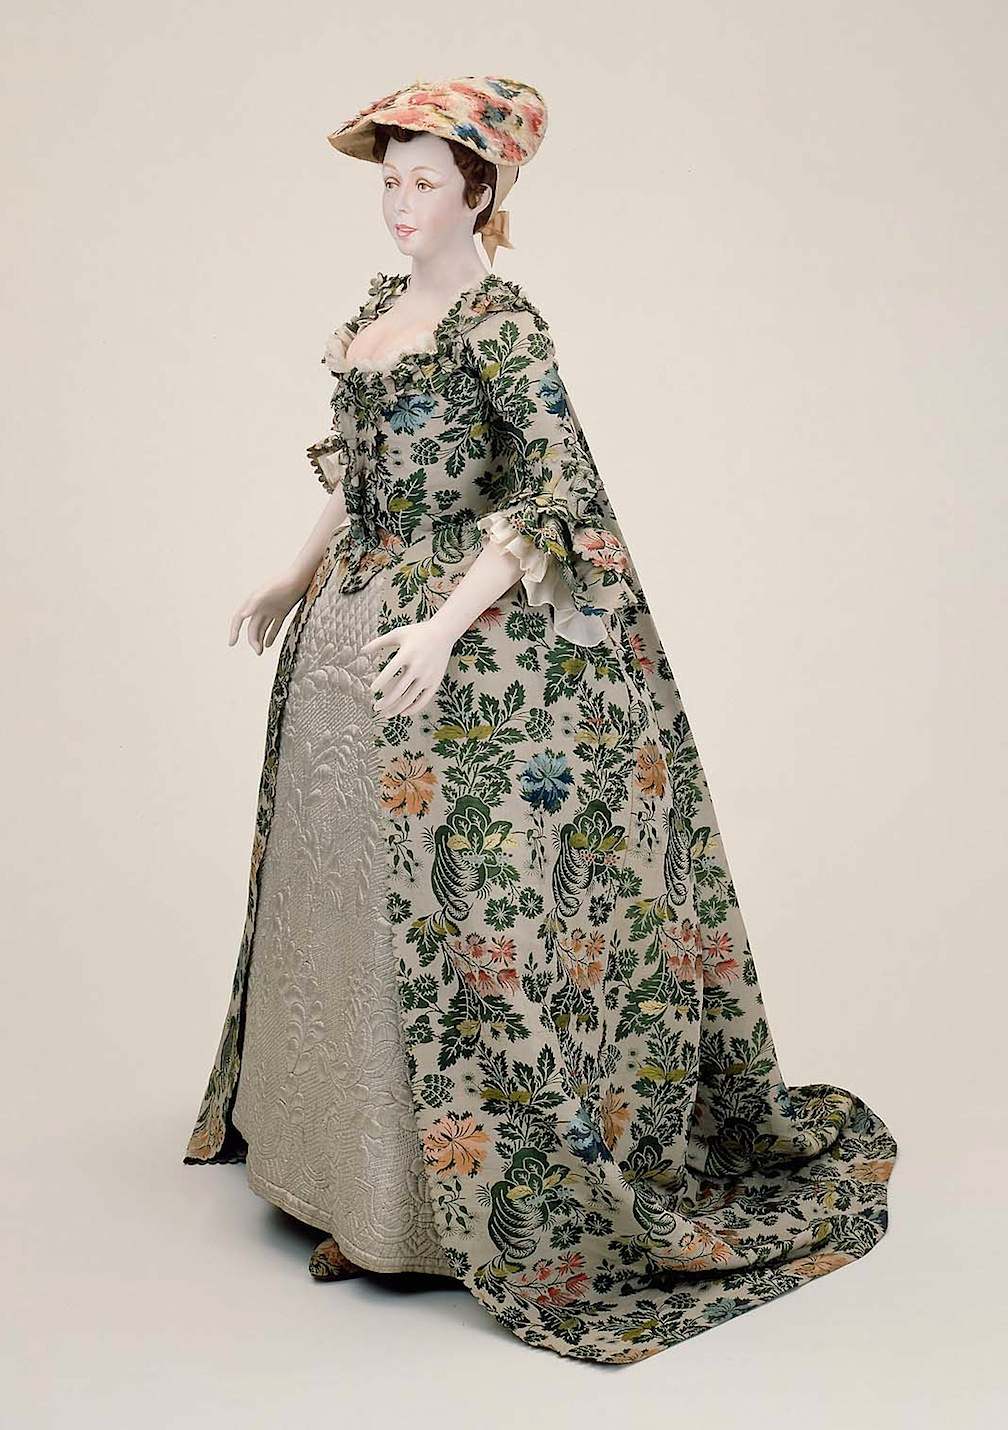 Wedding dress worn by Nathaniel Carter's Bride, Mary Beck, Newburyport 1742